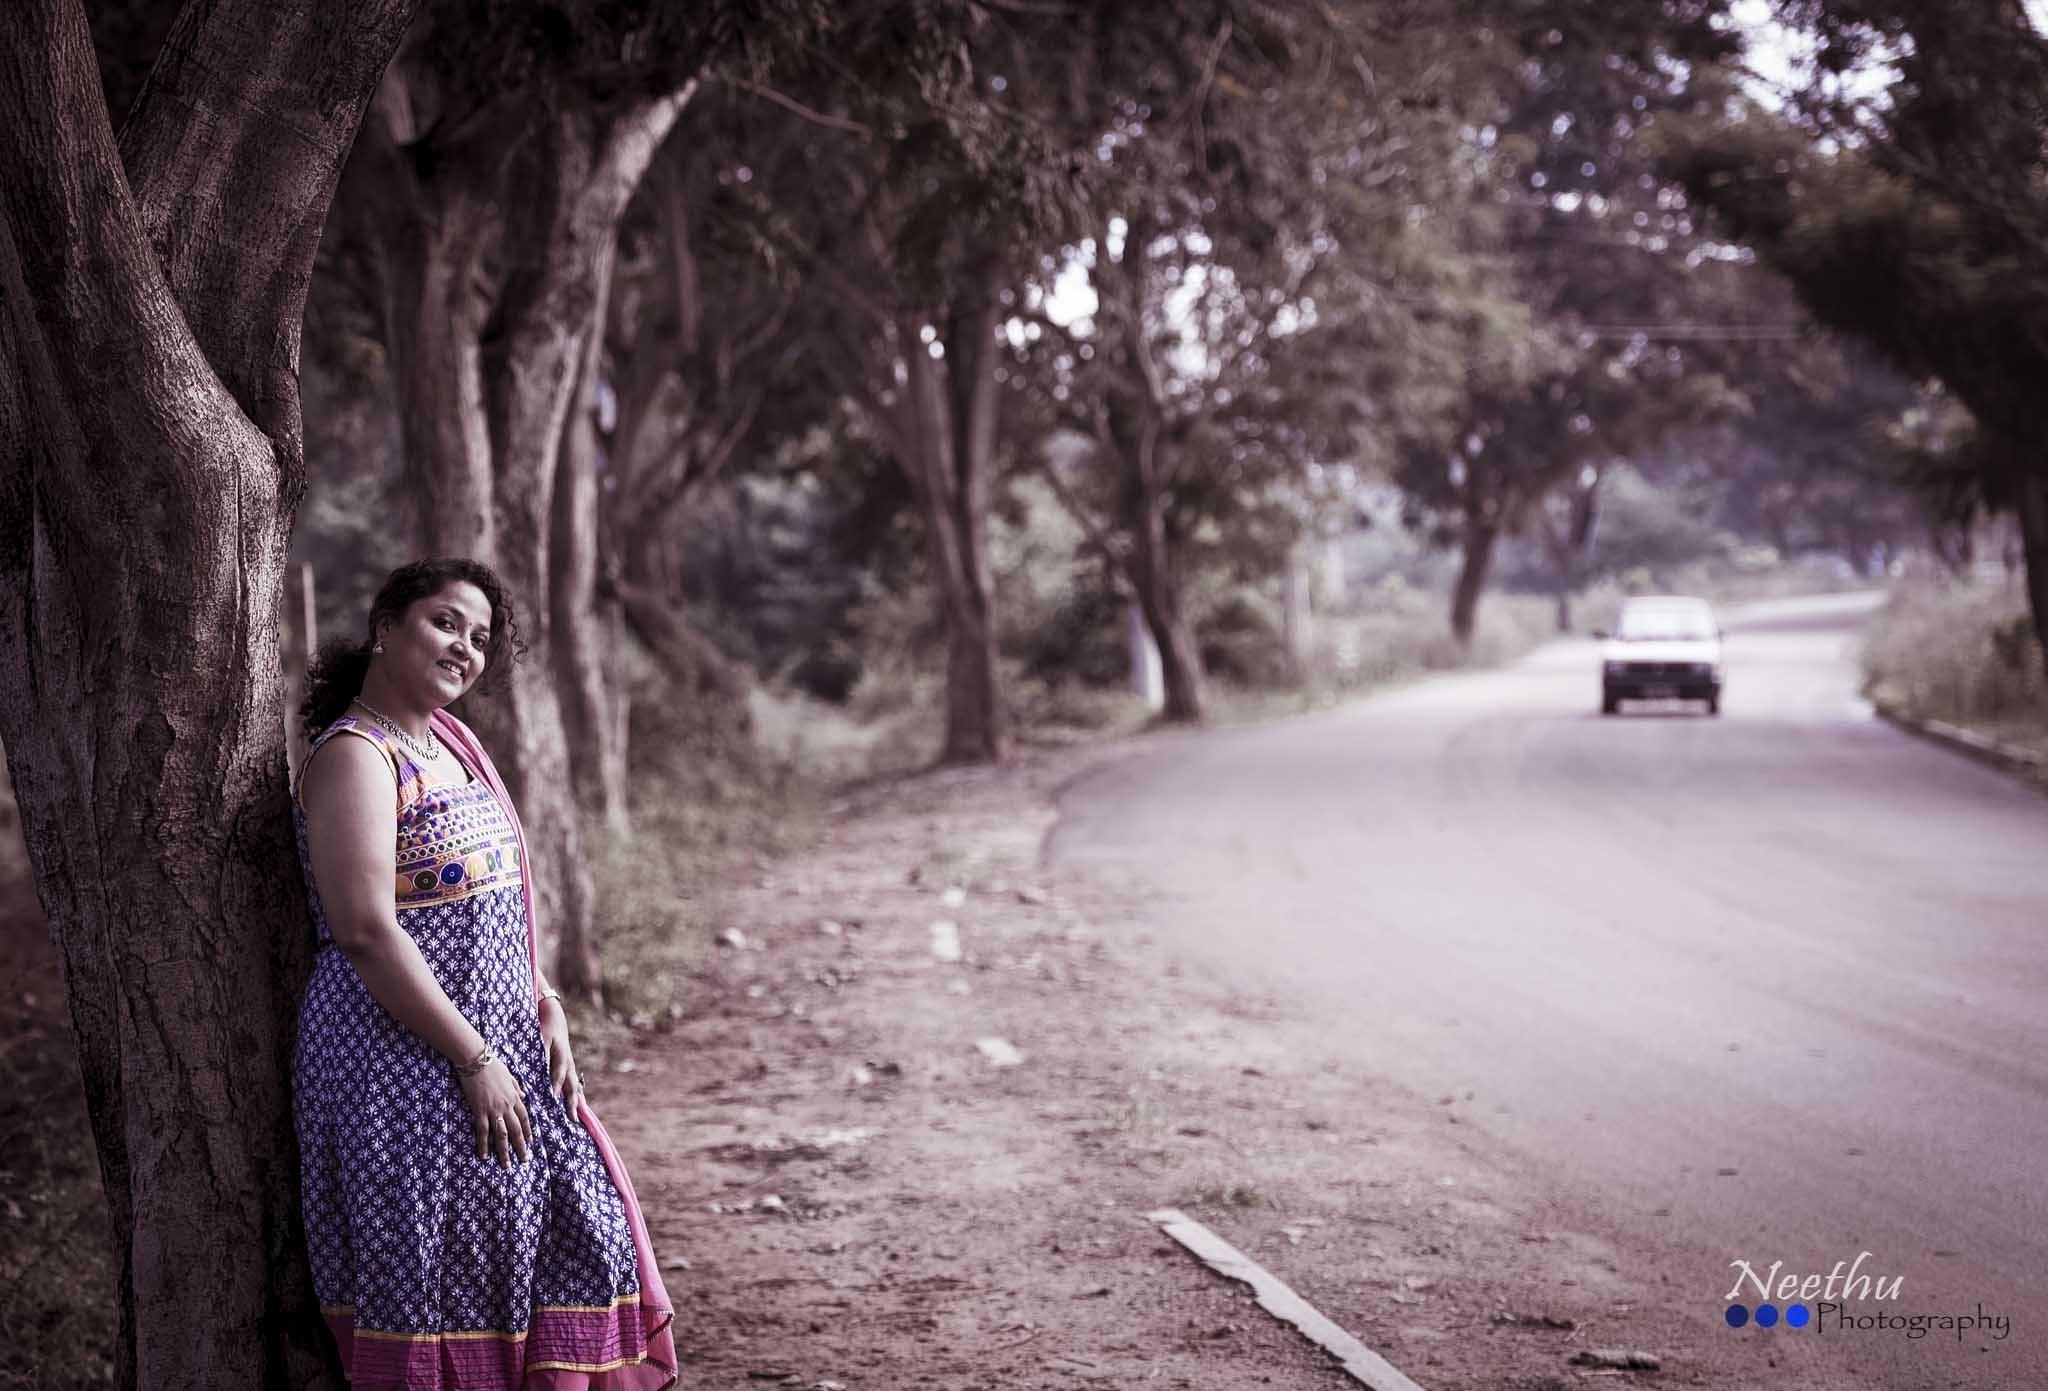 Twilight evening by Neetha MH